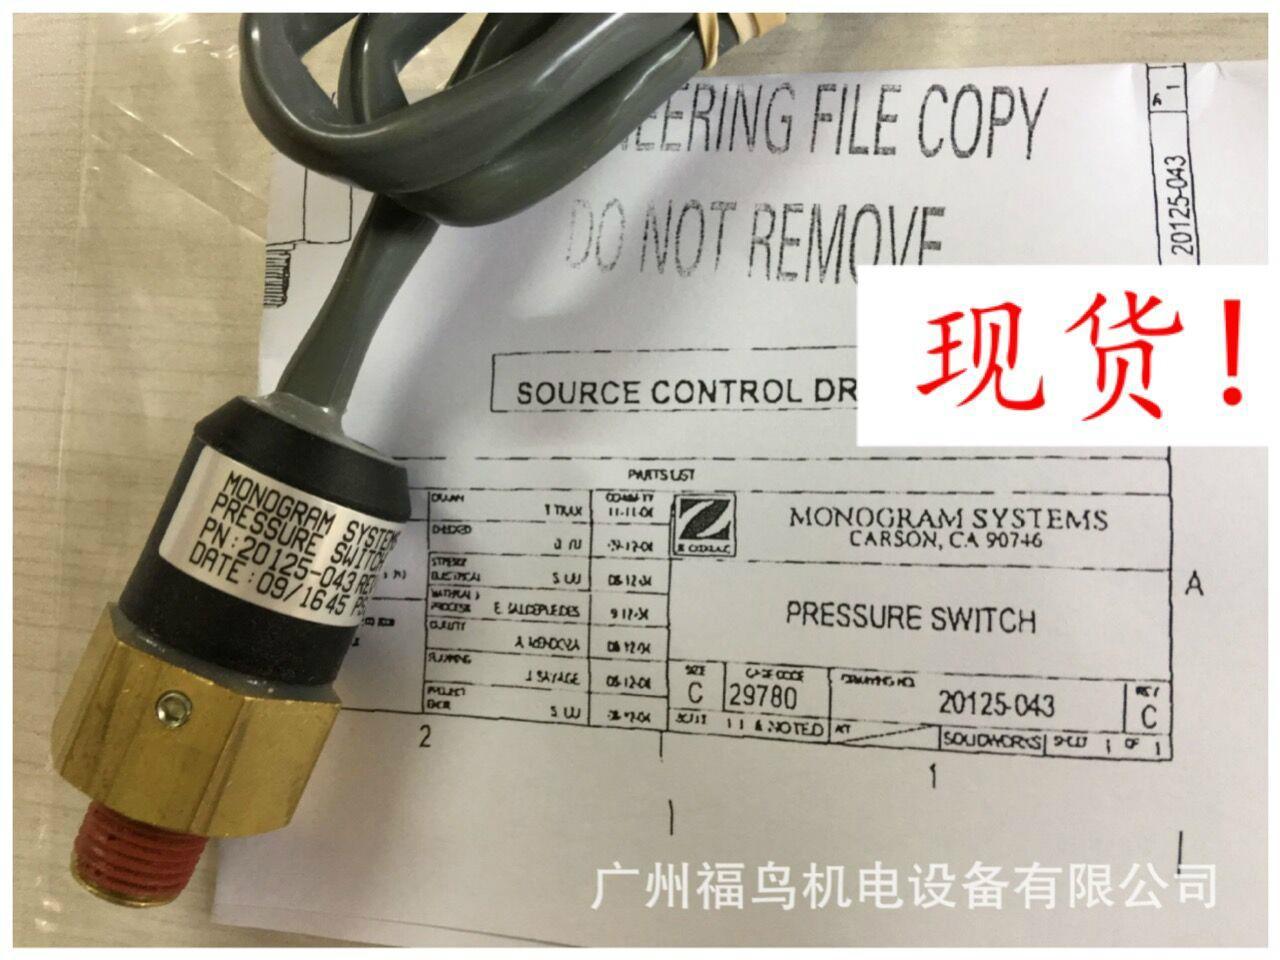 NASON(MONOGRAM SYSTEMS)壓力開關, 型號: 20125-043